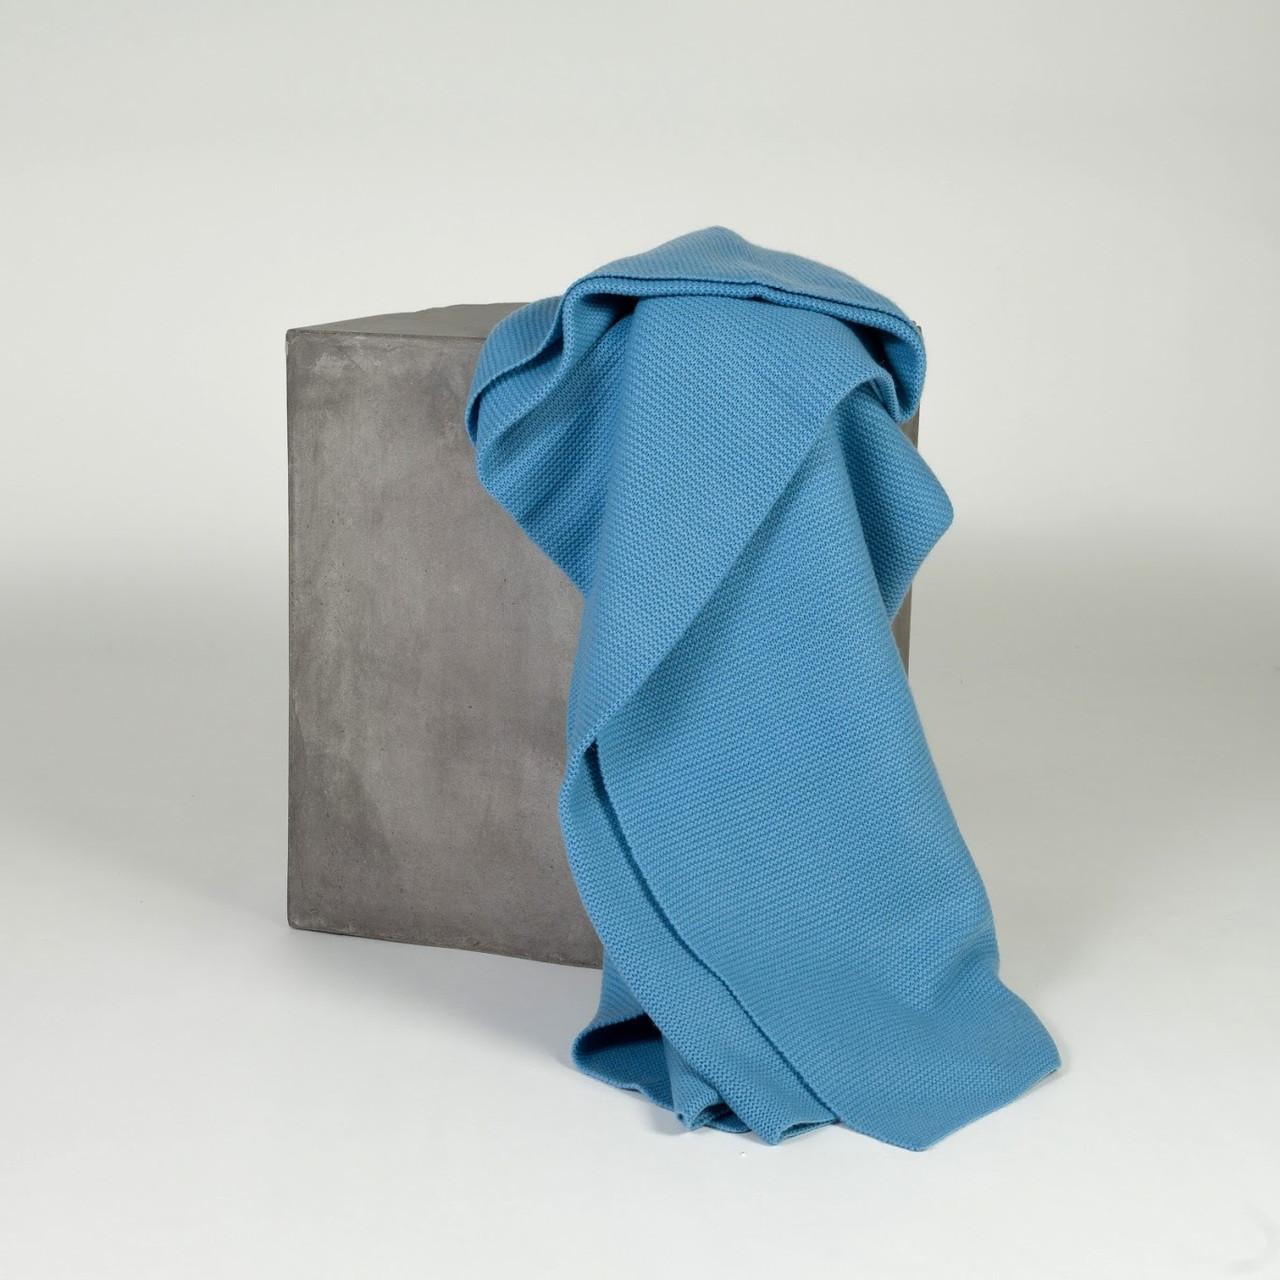 Sky Blue Purl Knit Cashmere Throw